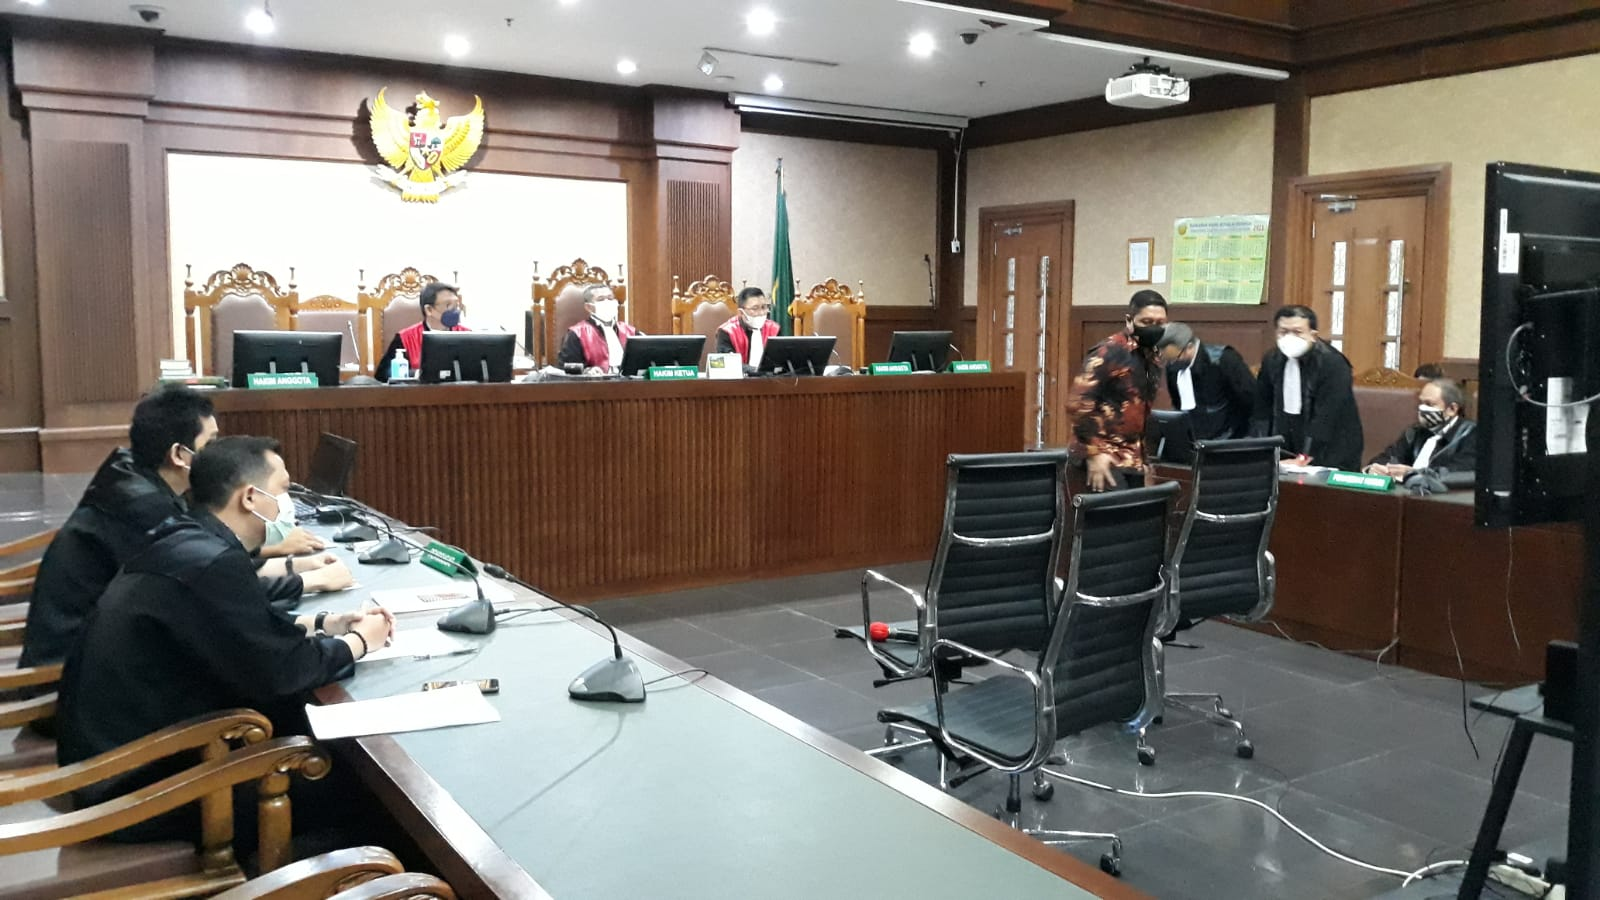 Eks Walikota Tanjungbalai Sebut Perkaranya Ditangani Penyidik Tim Taliban